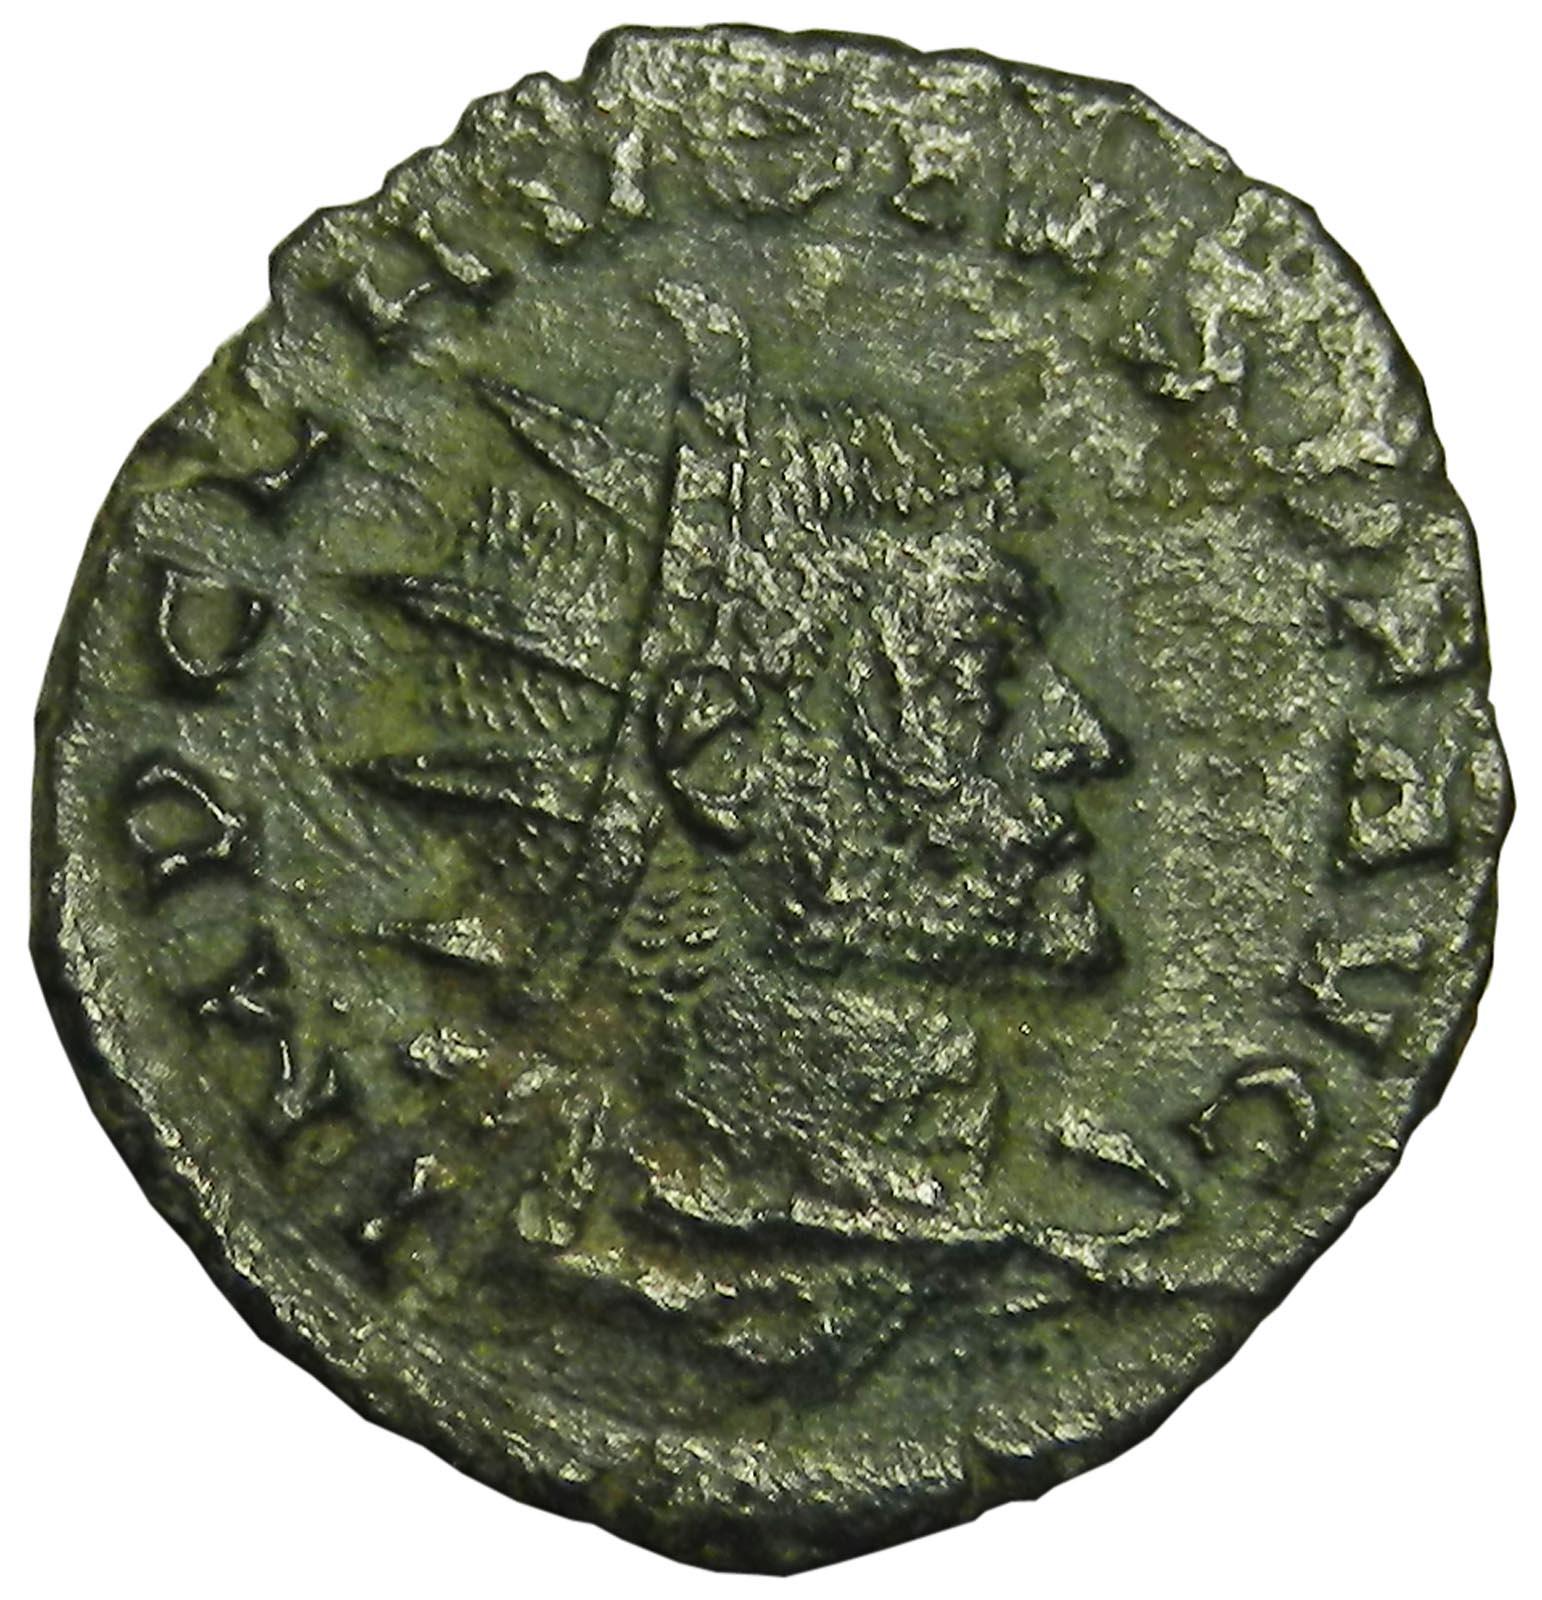 Монета антониниан. Клавдий II Готский. Бронза. Древний Рим, 268 год (Фидес) римская легенда 2019 05 30t19 00